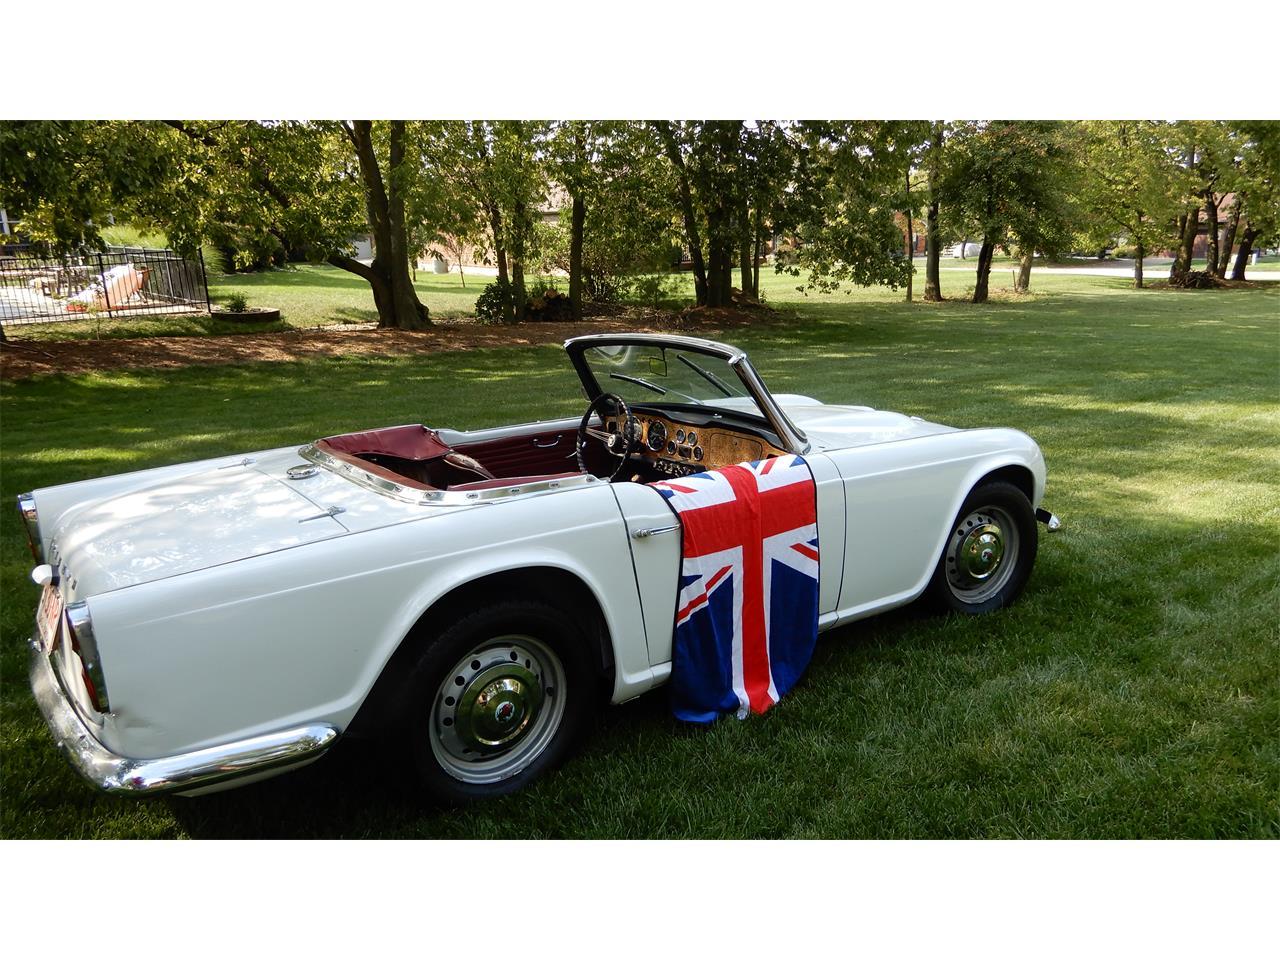 1965 Triumph Tr4 For Sale Classiccarscom Cc 1022927